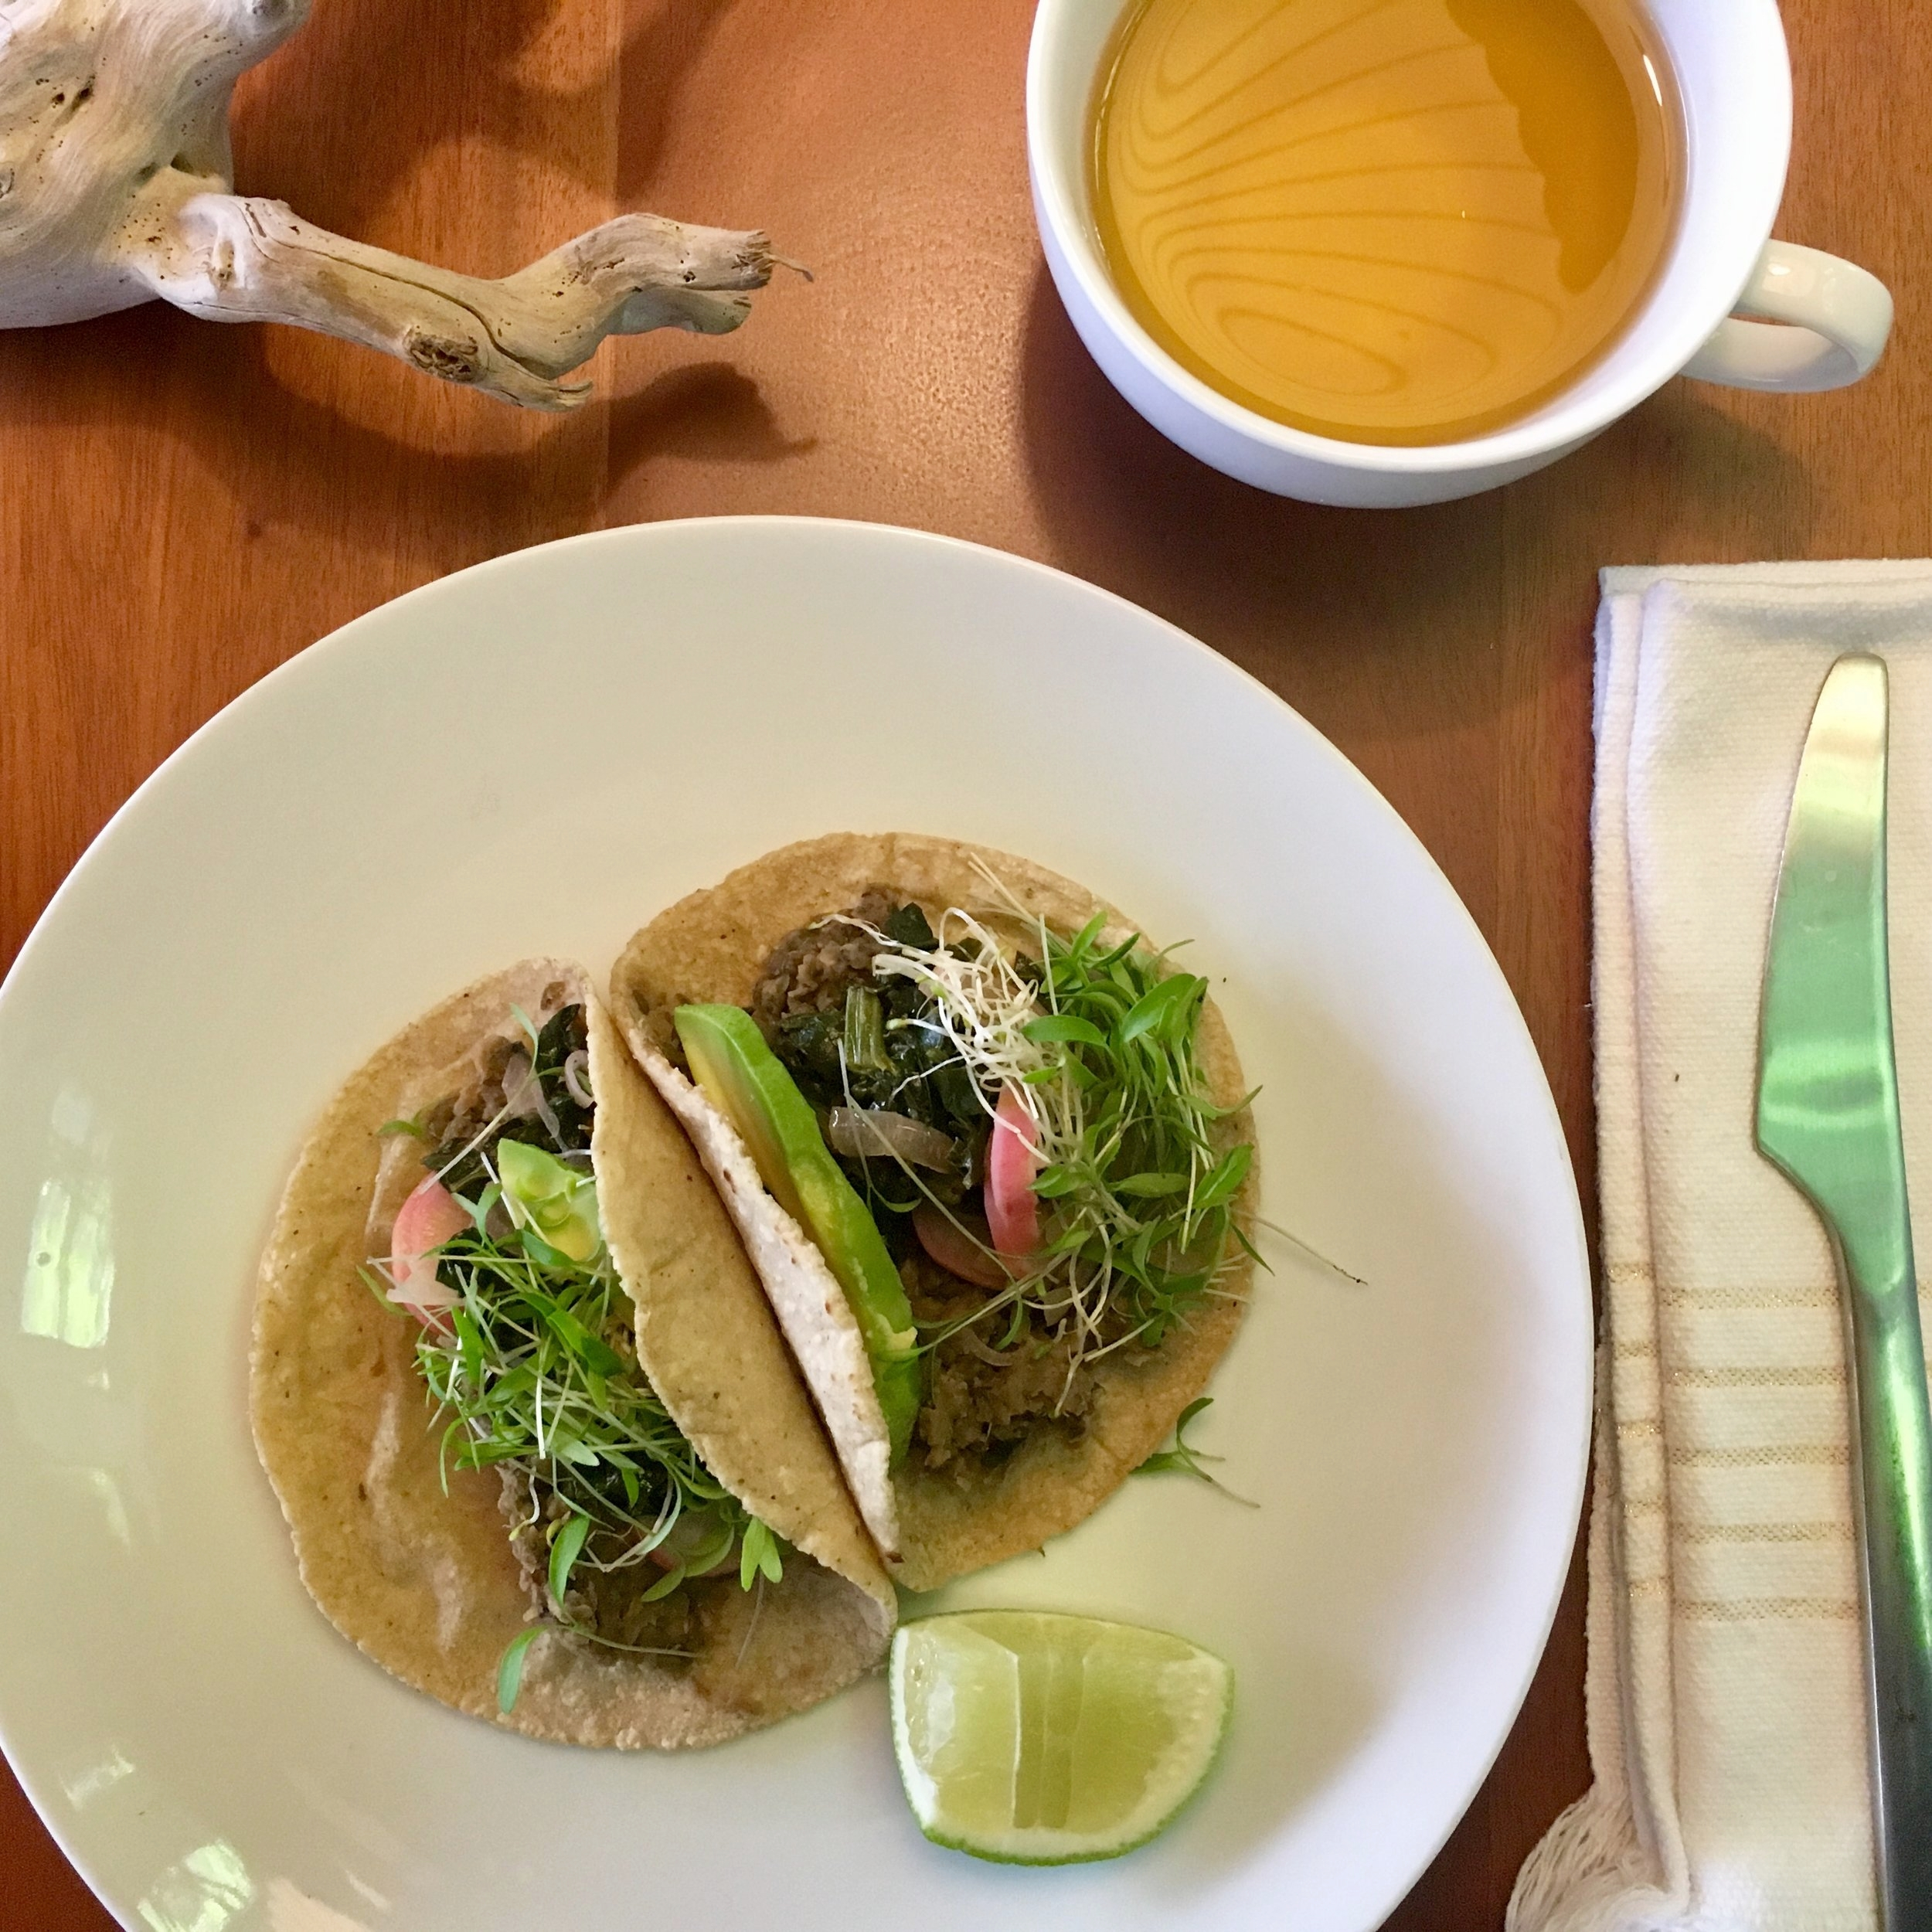 Spring Green & Mung Bean Tacos